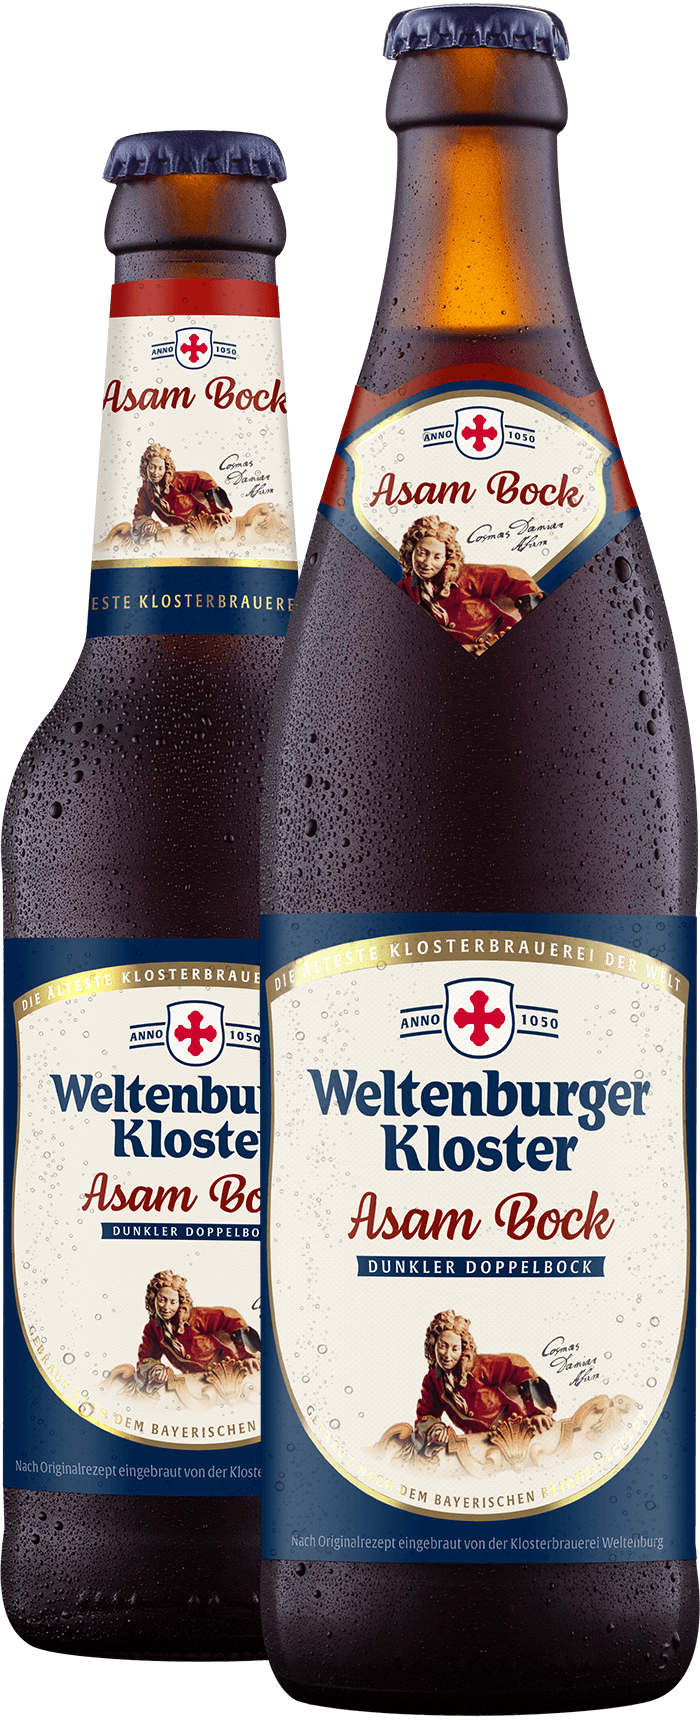 Weltenburger-Kloster-Flasche-Asam-Bock-0-5l-0-33l-ManhartMedia_Bier-Detail_01